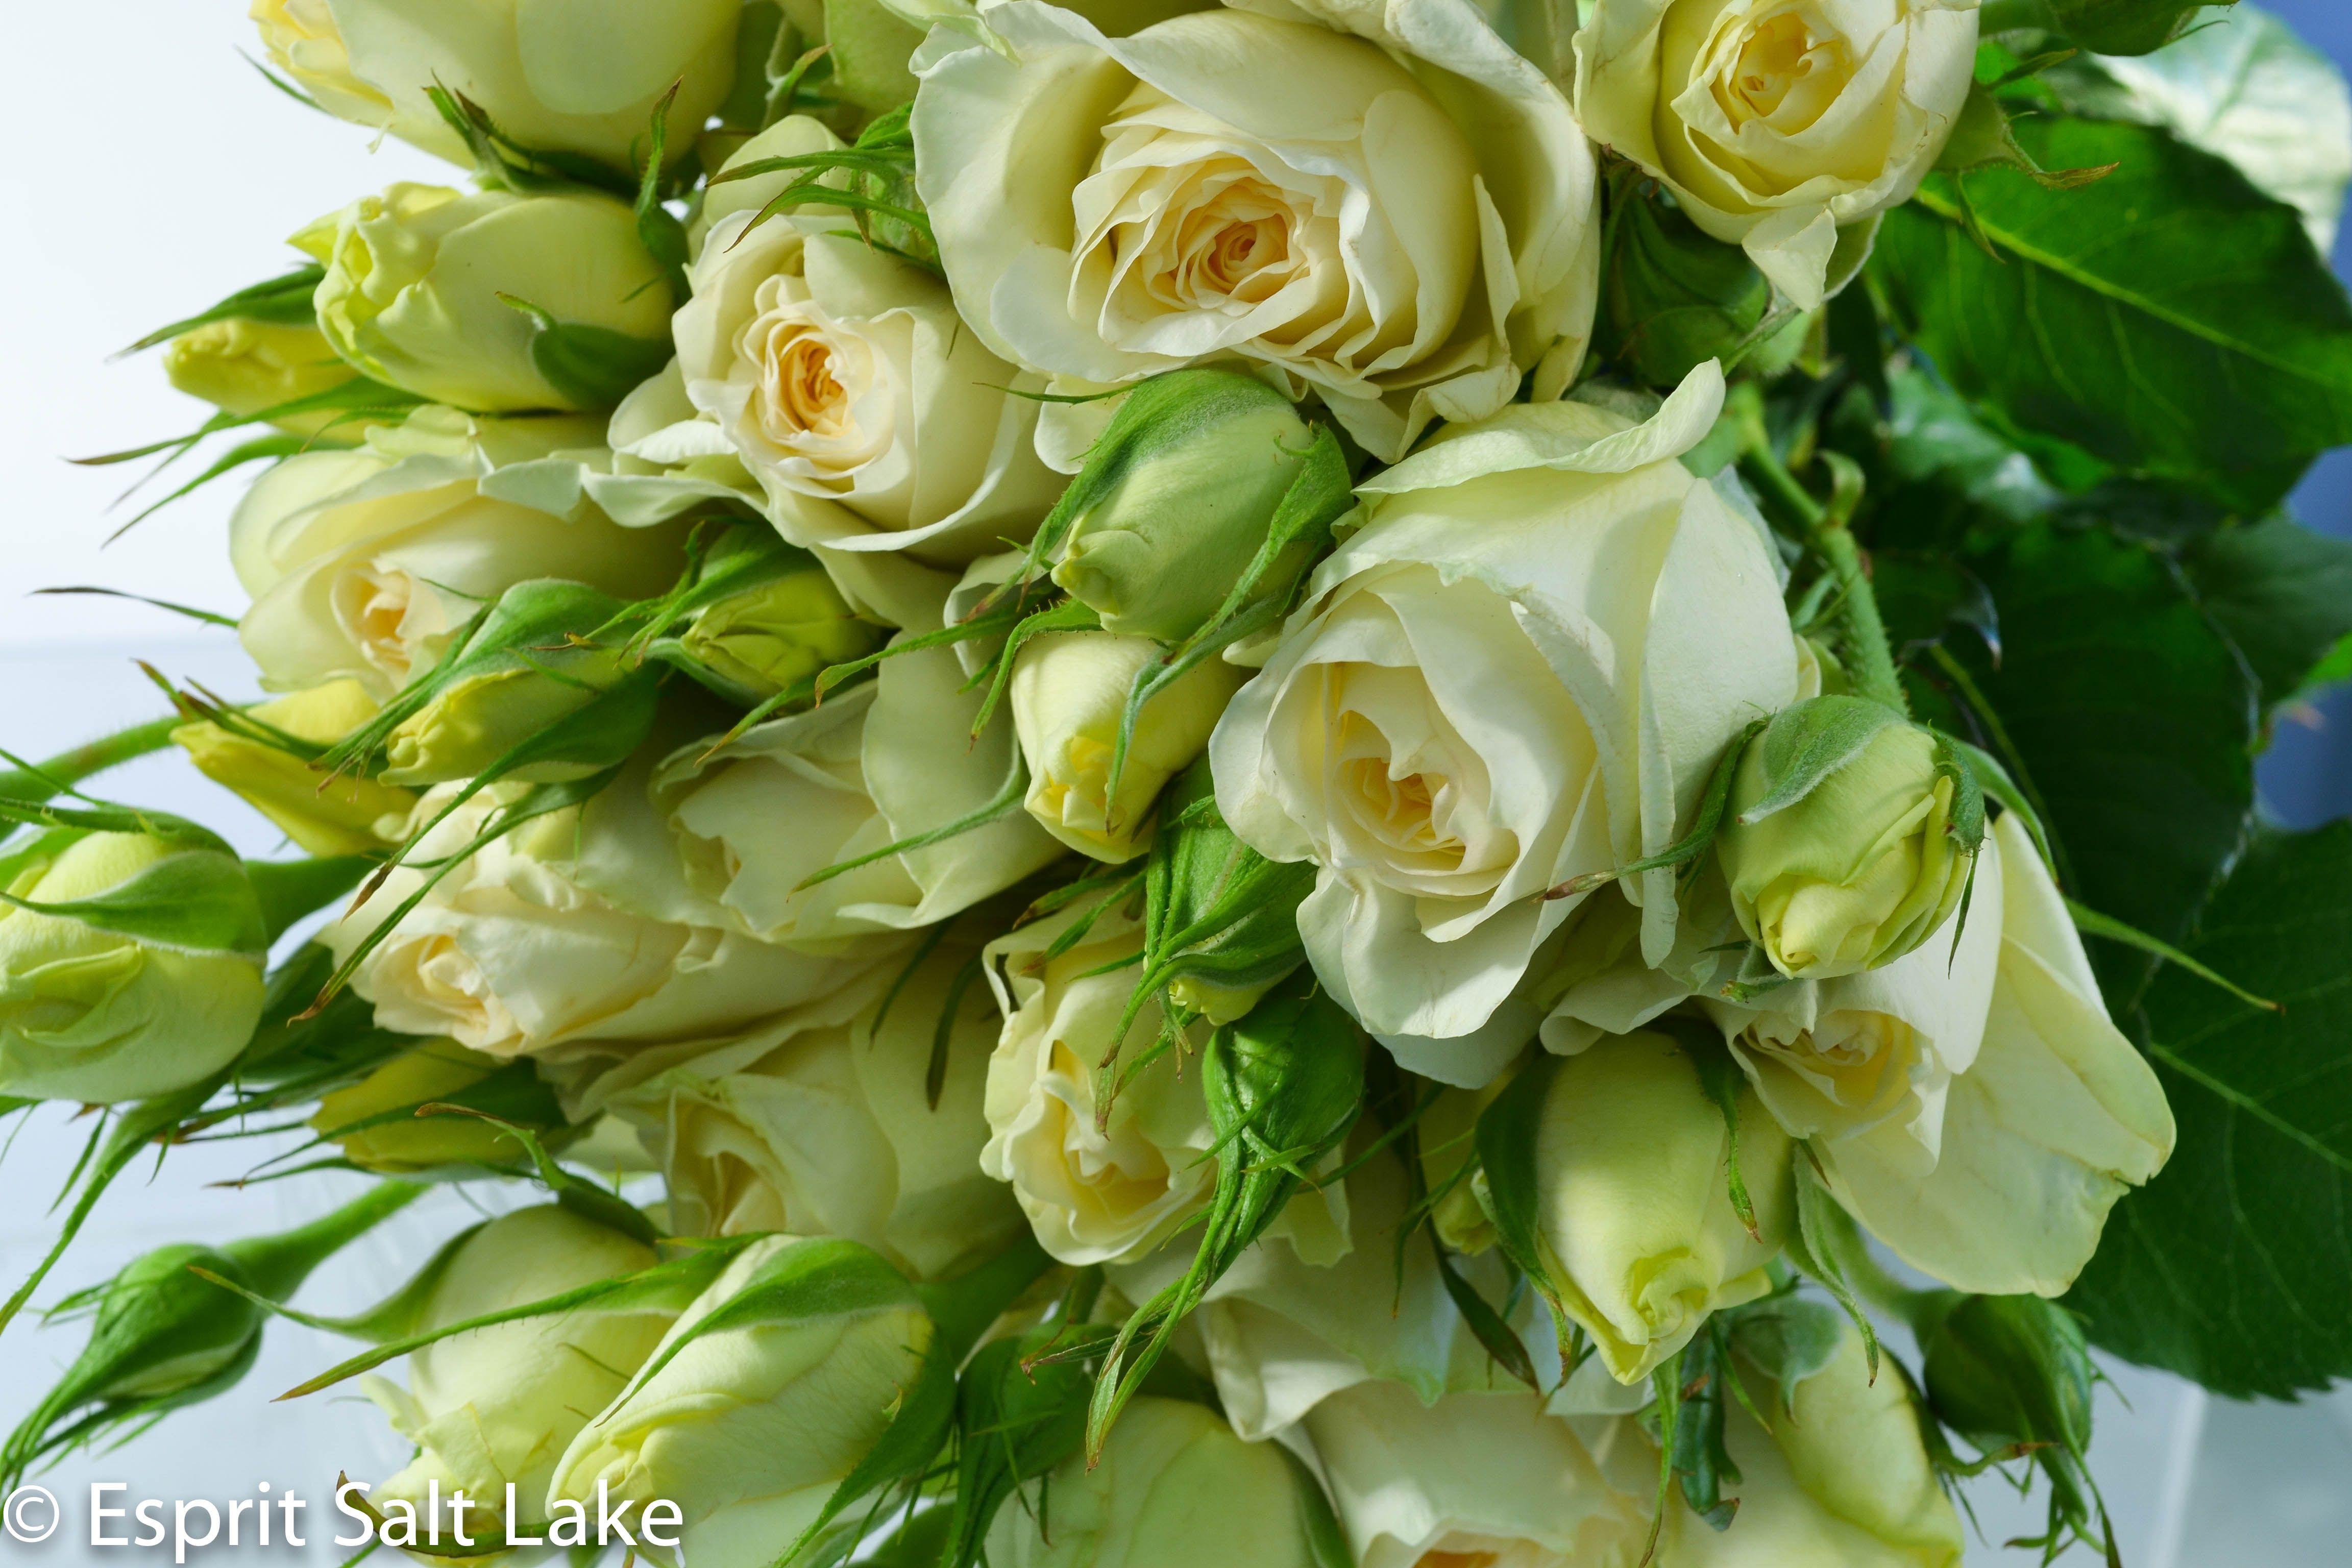 claire de lune cream garden spray rose these are the pale yellow ones - Cream Garden Rose